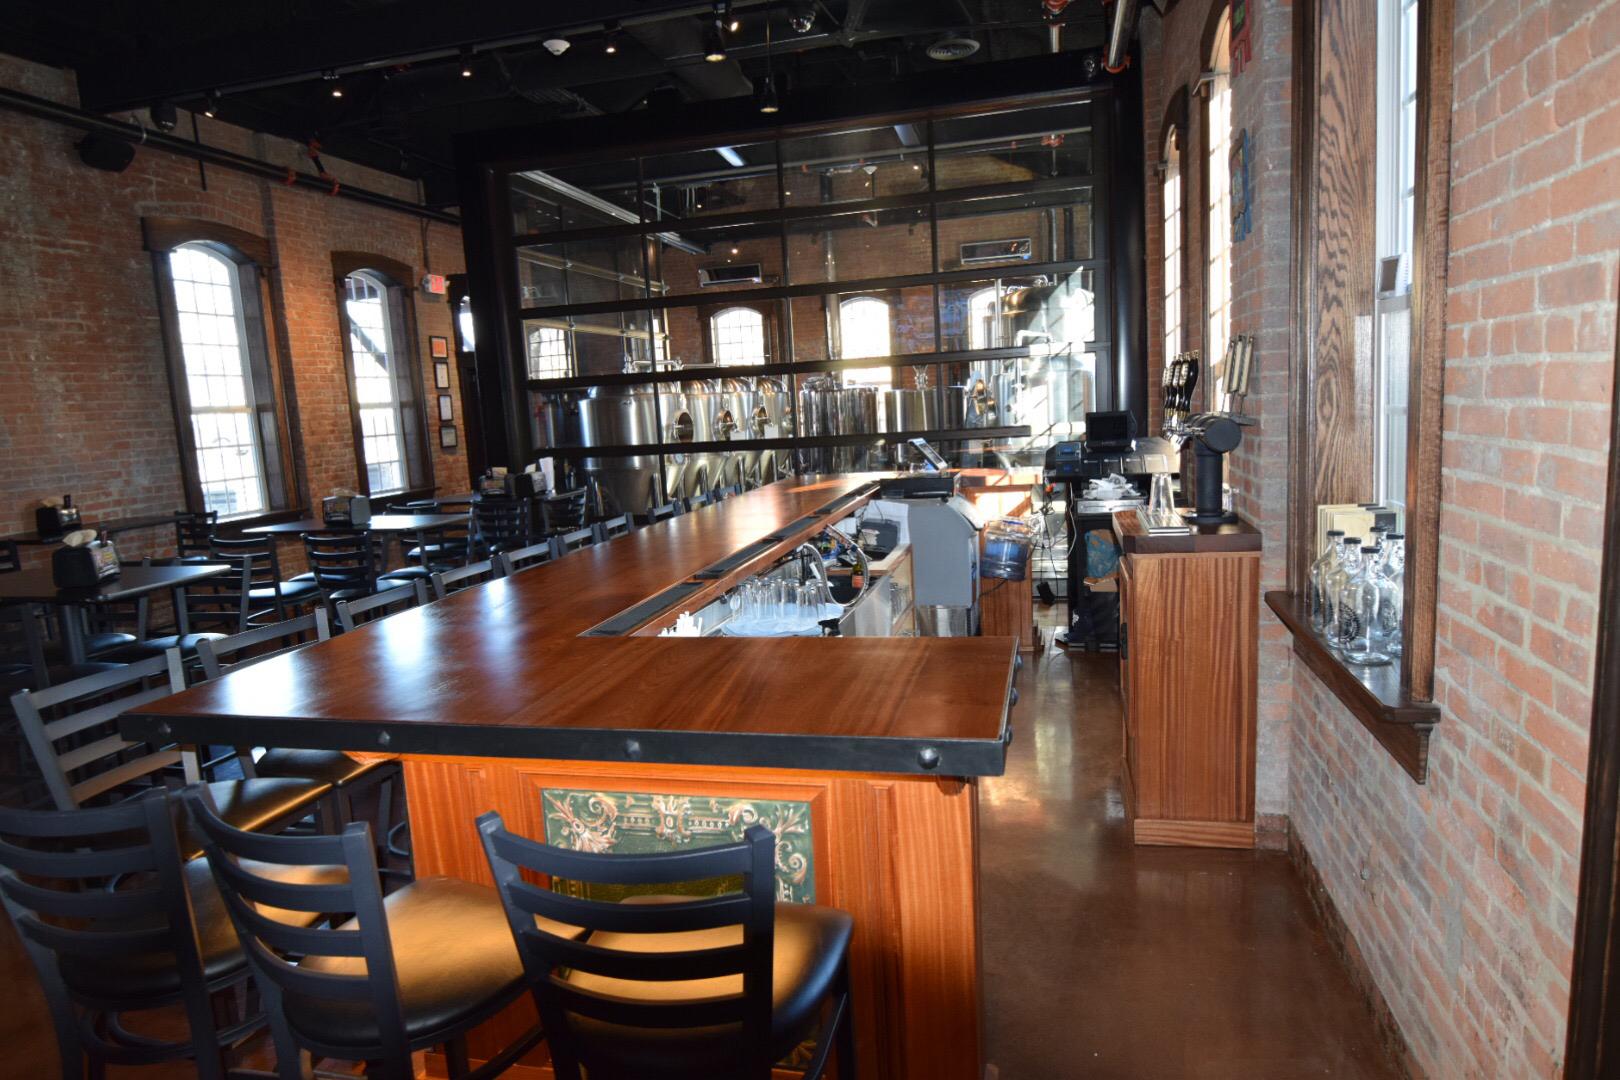 sapele-bar-clemson-brewing-middletown-ny.jpg